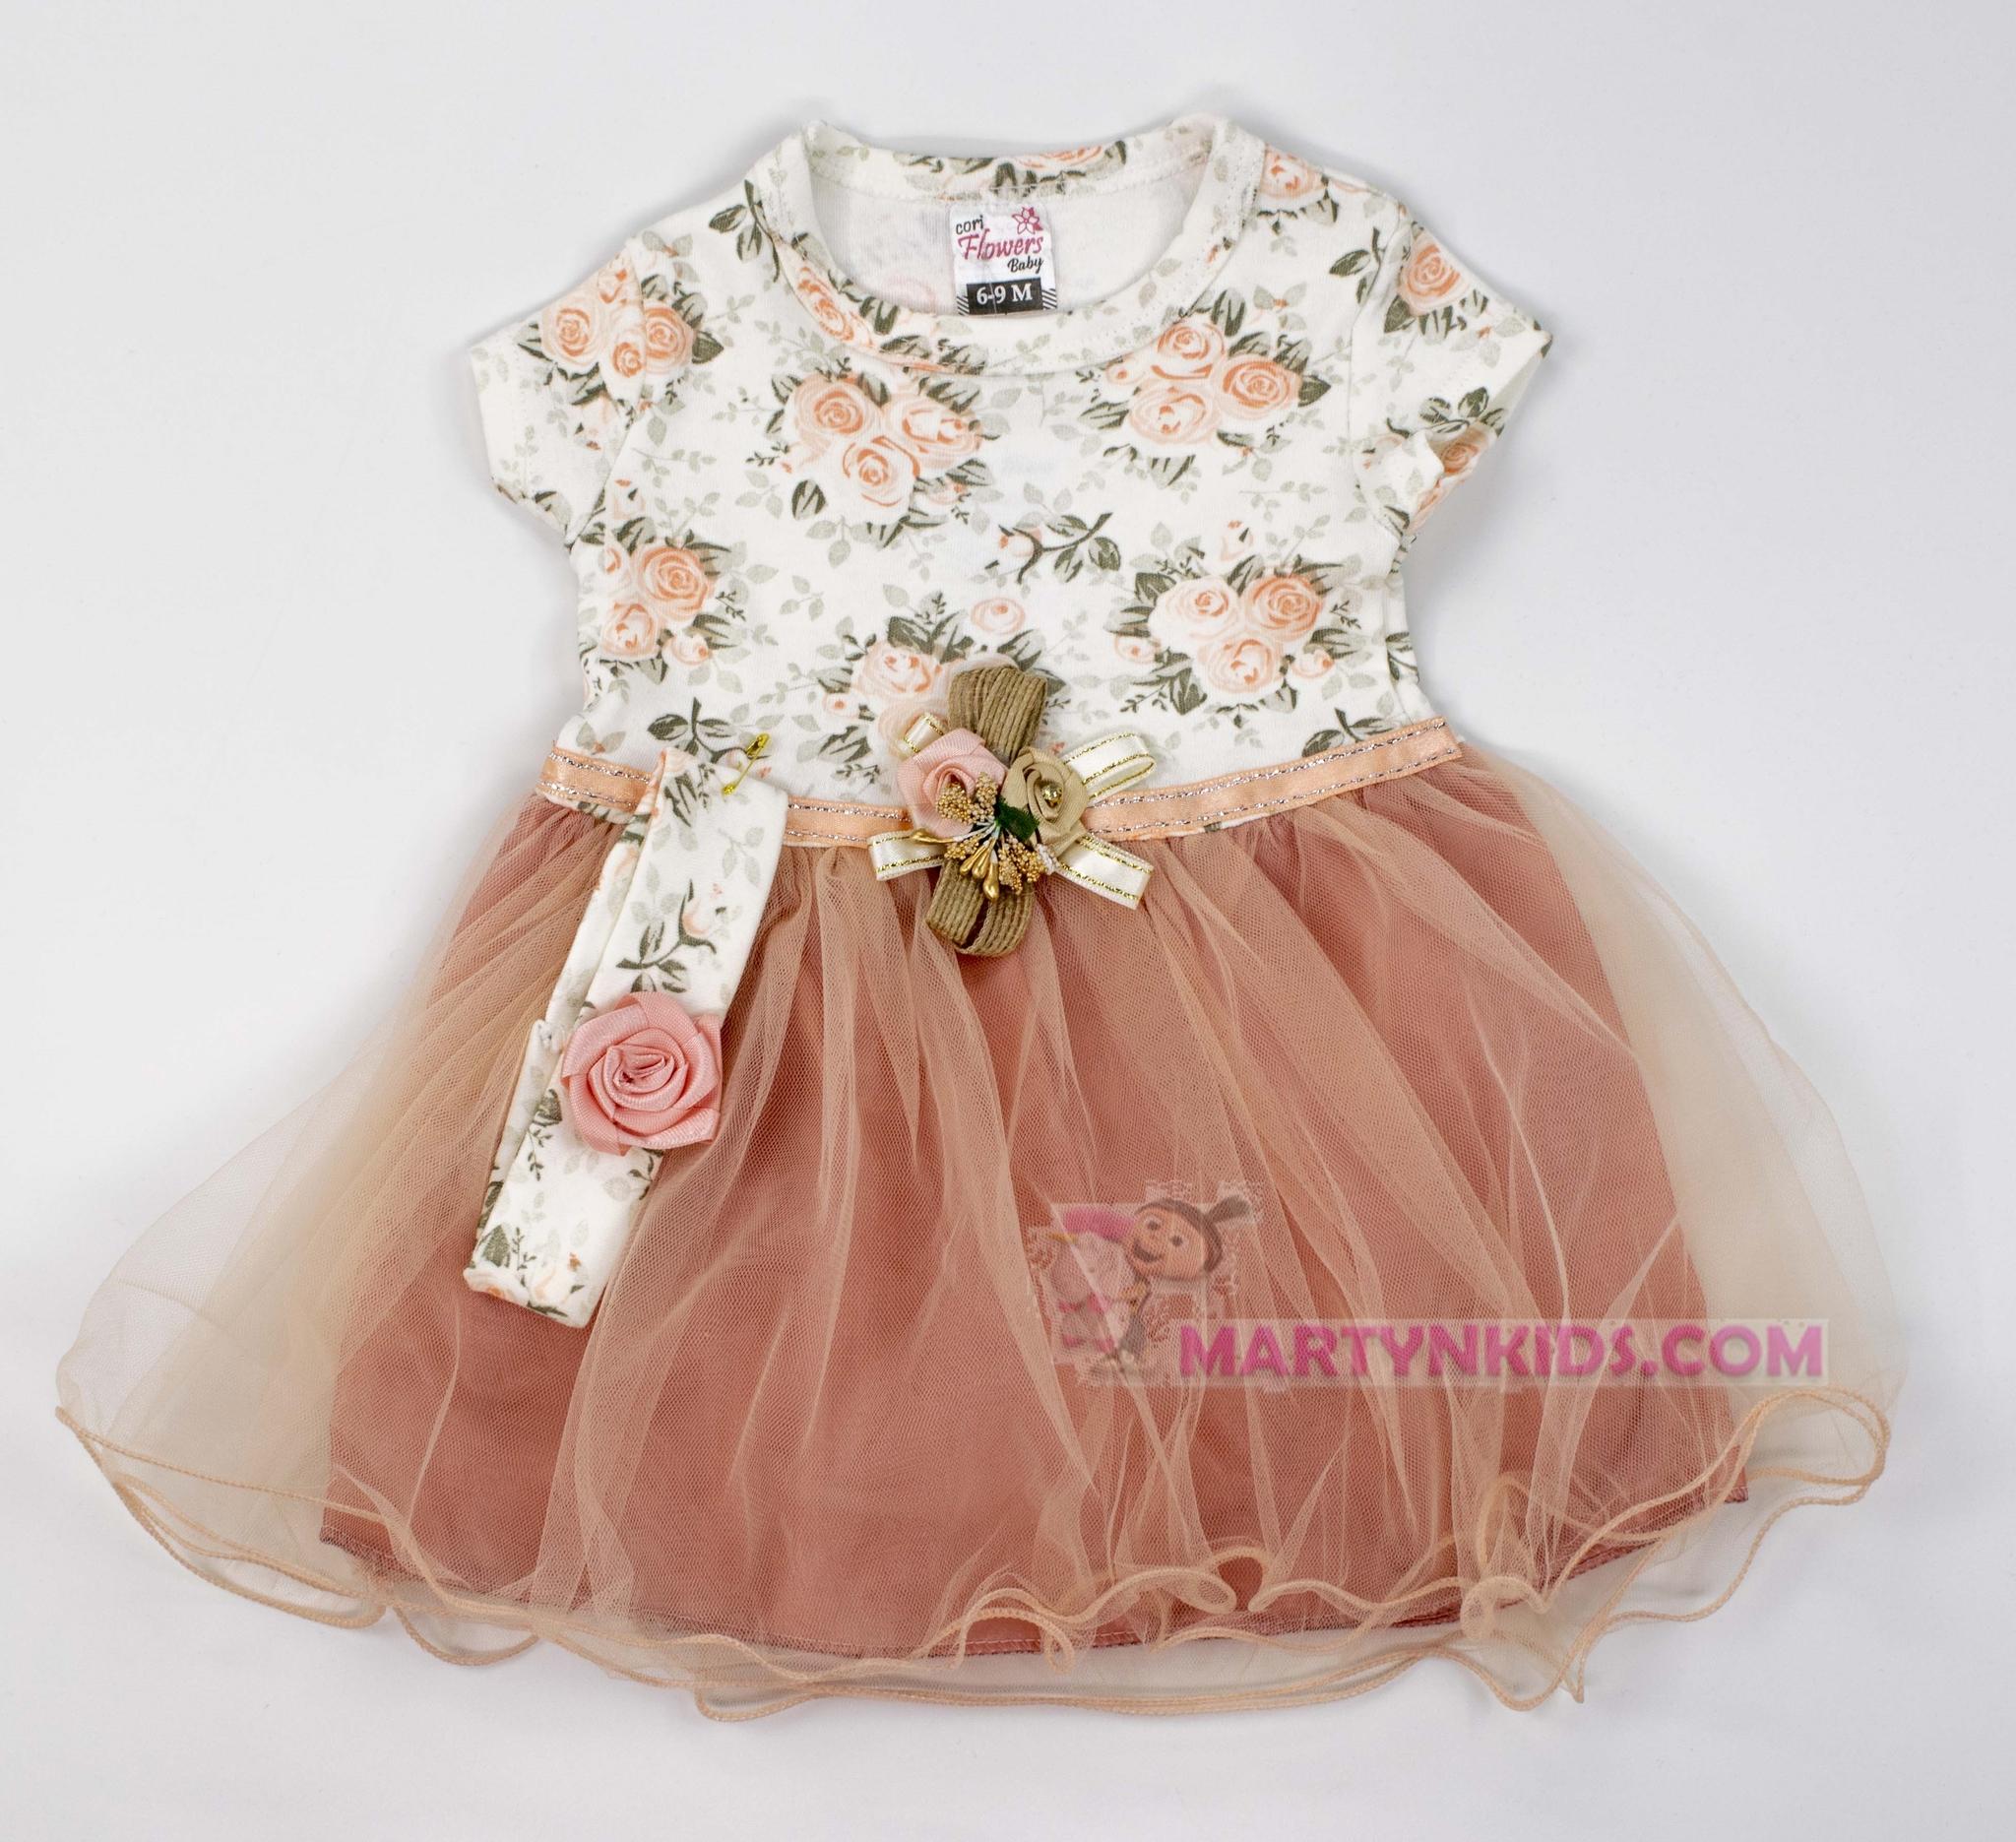 3407 платье Розочки гепюр